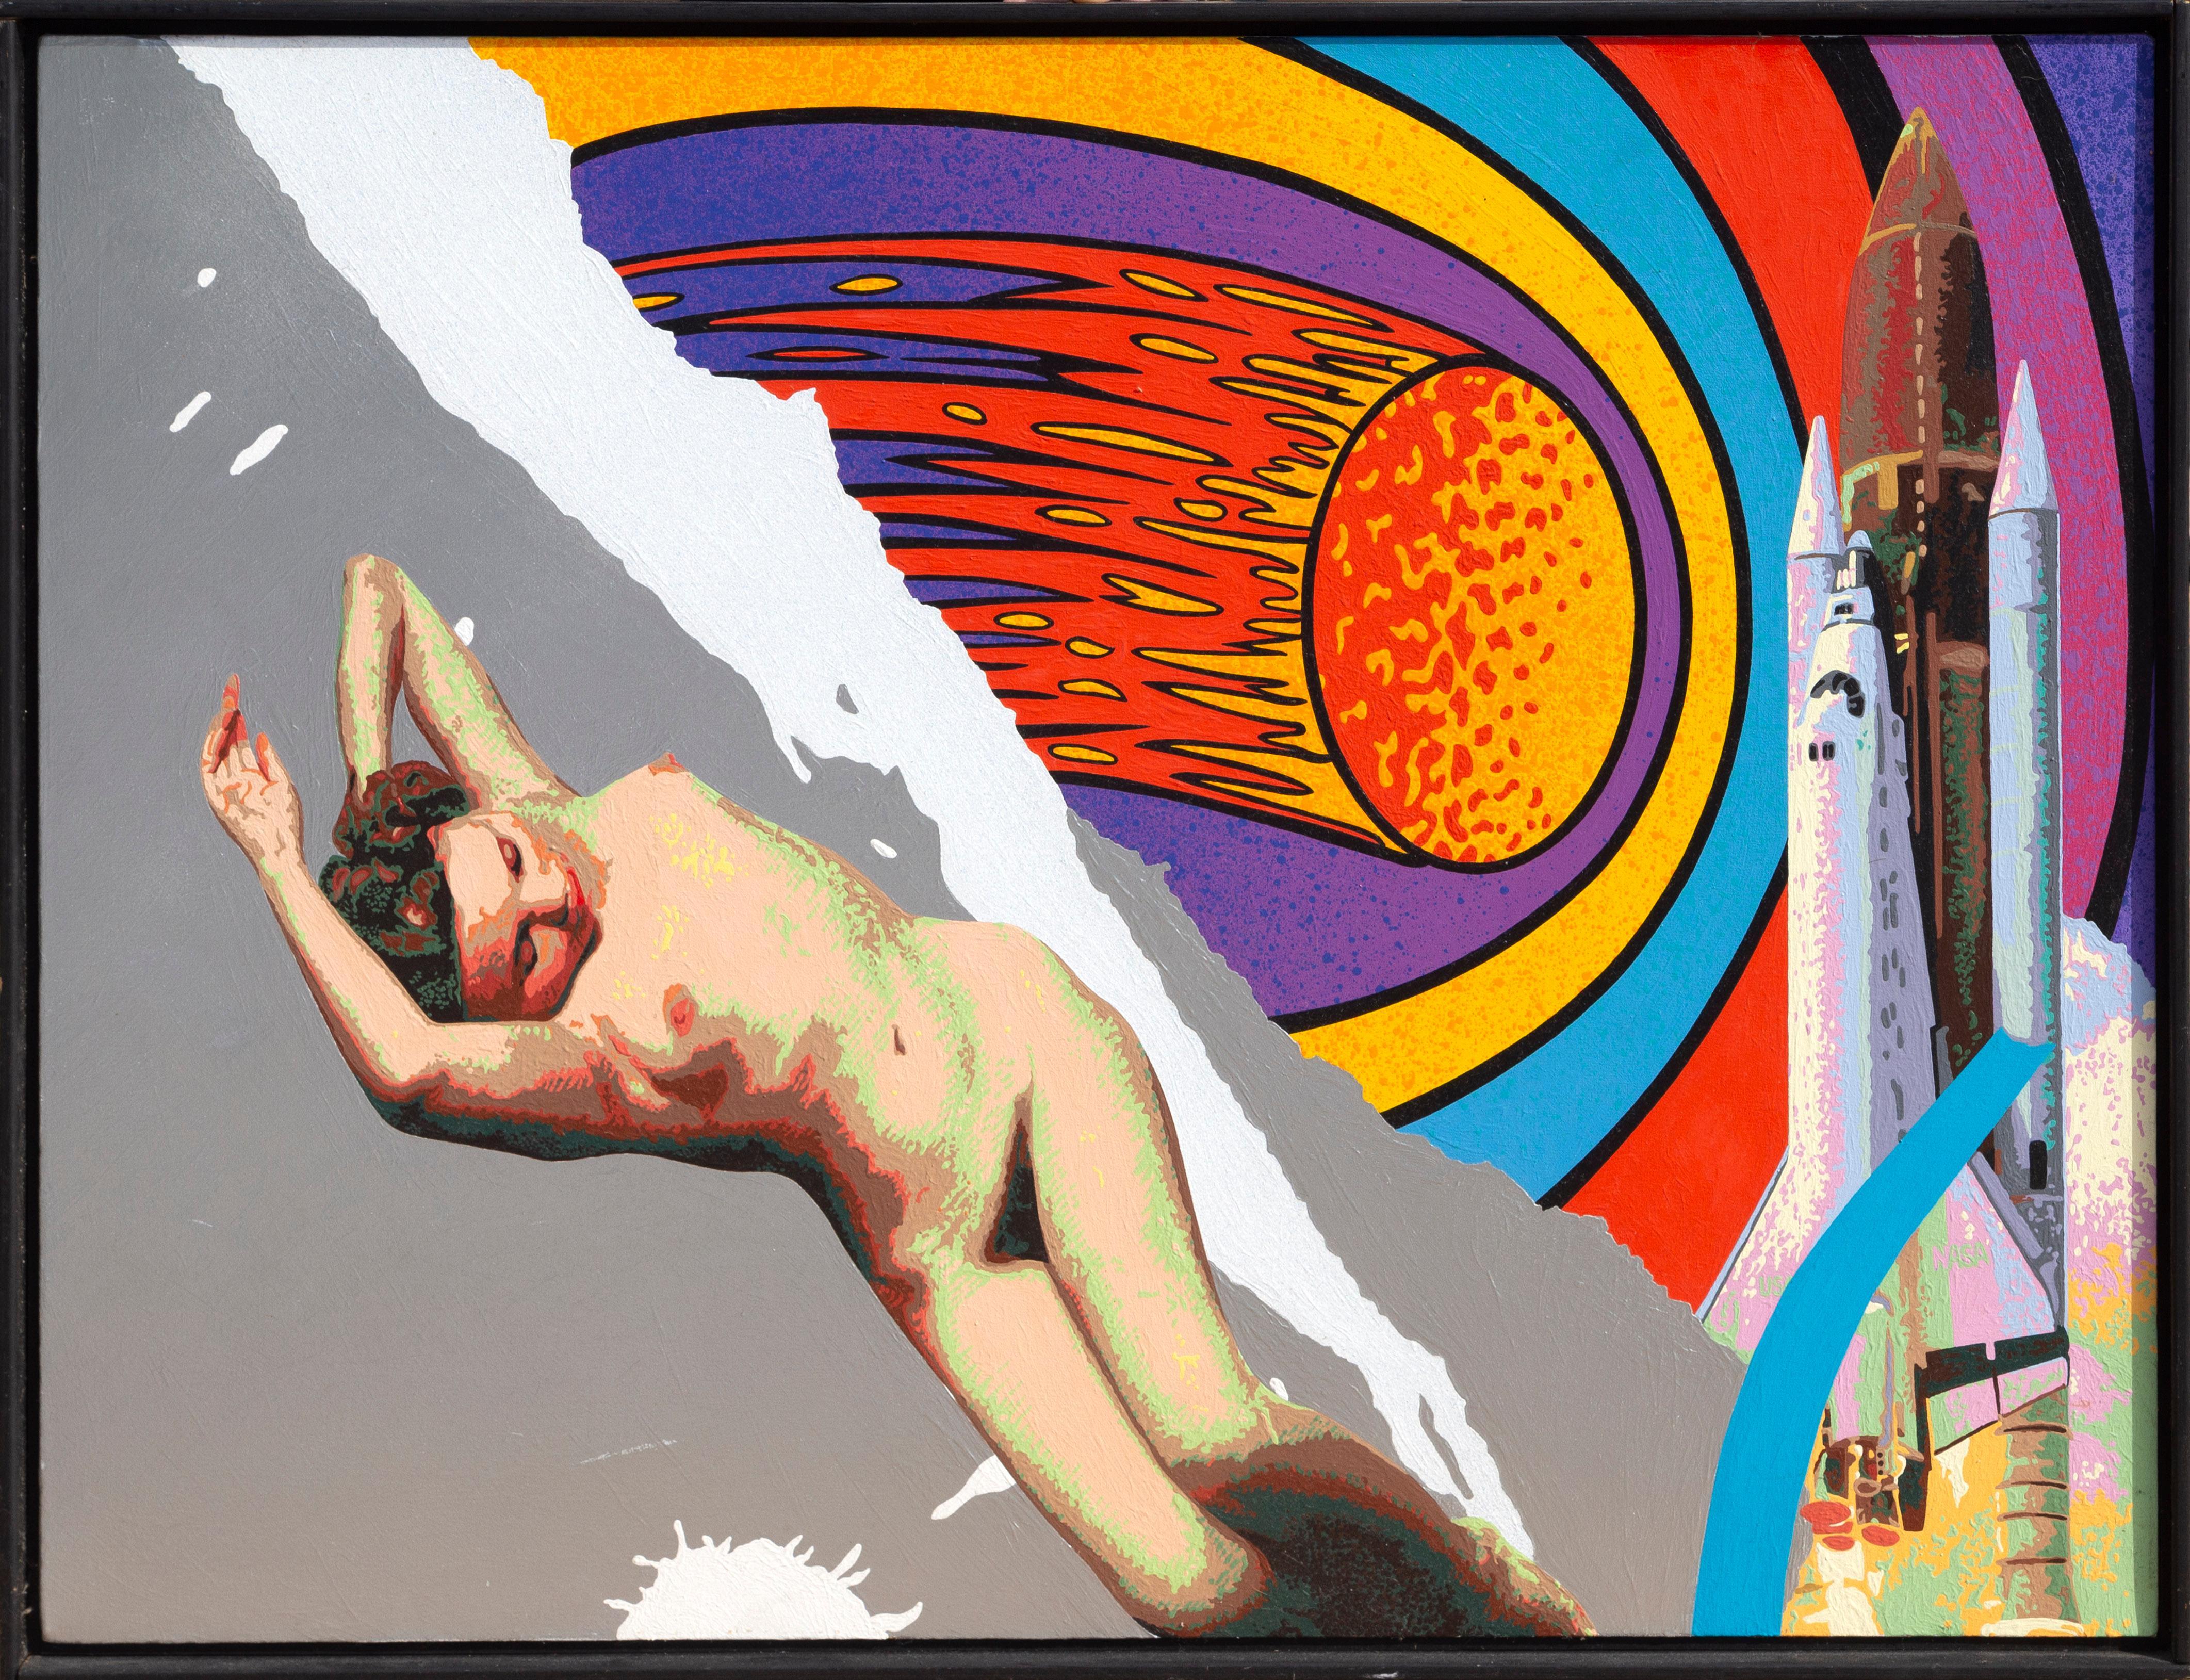 Bare Essence, Pop Art Acrylic Painting by Michael Knigin